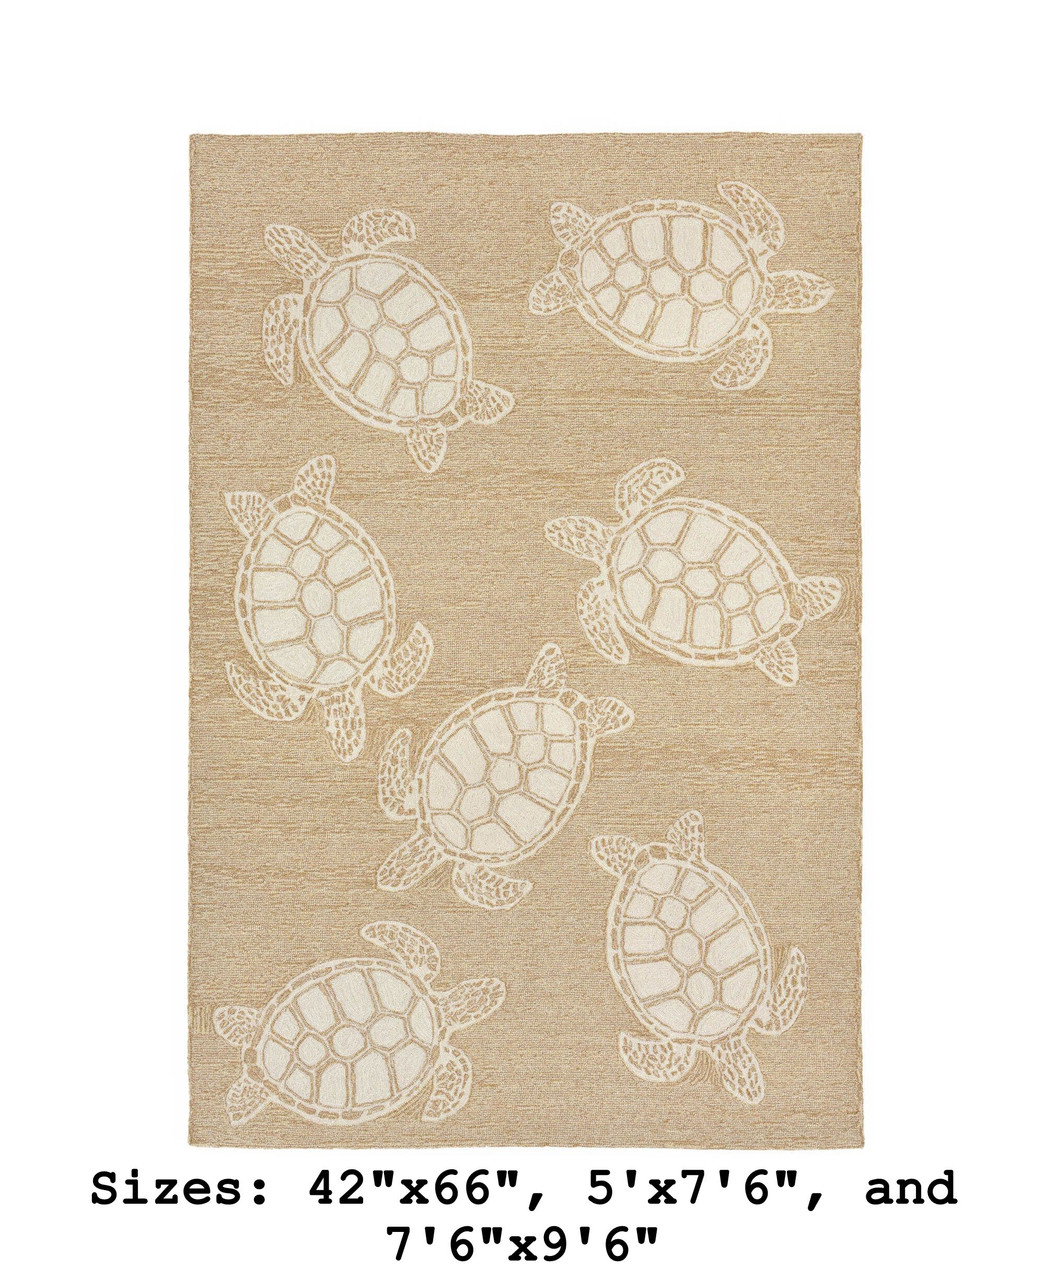 Capri Turtle Indoor/Outdoor Rug - Neutral - Large Rectangle